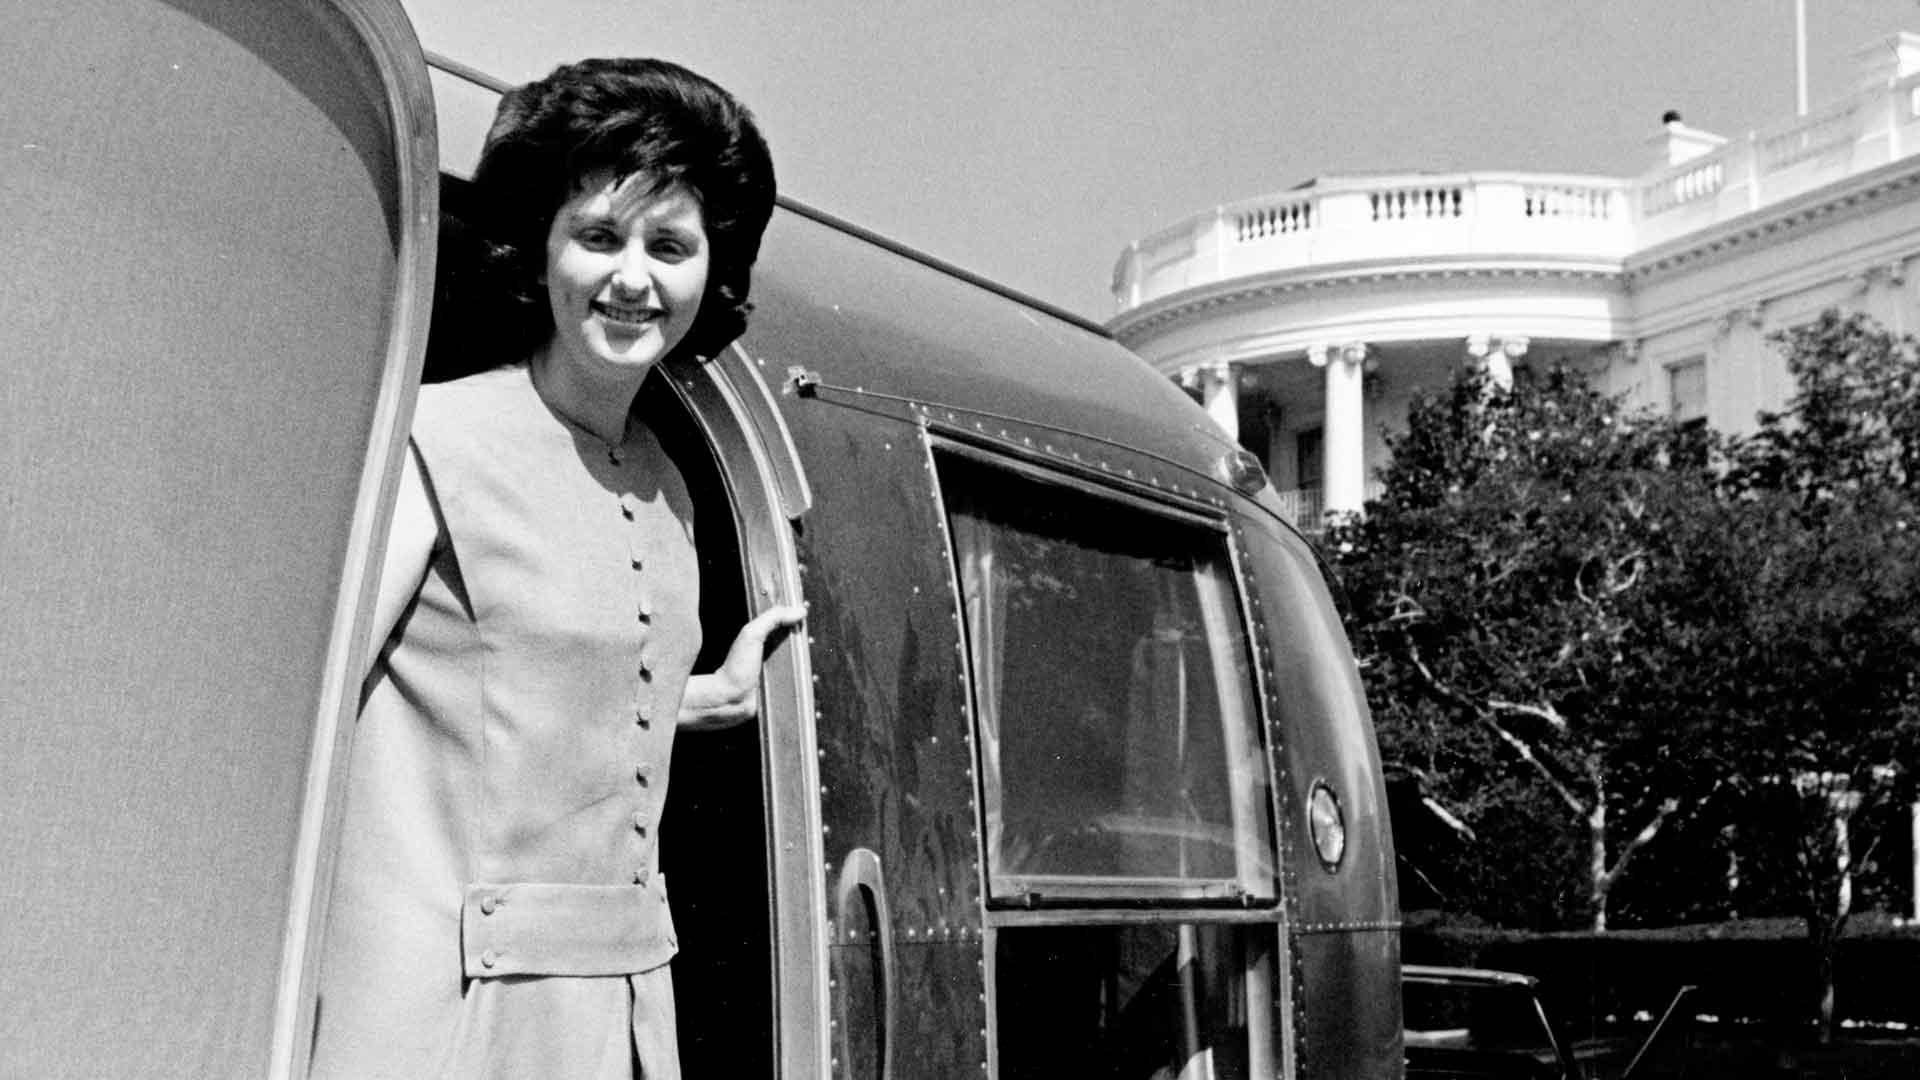 Lynda-Bird-Johnson-White-House-1965